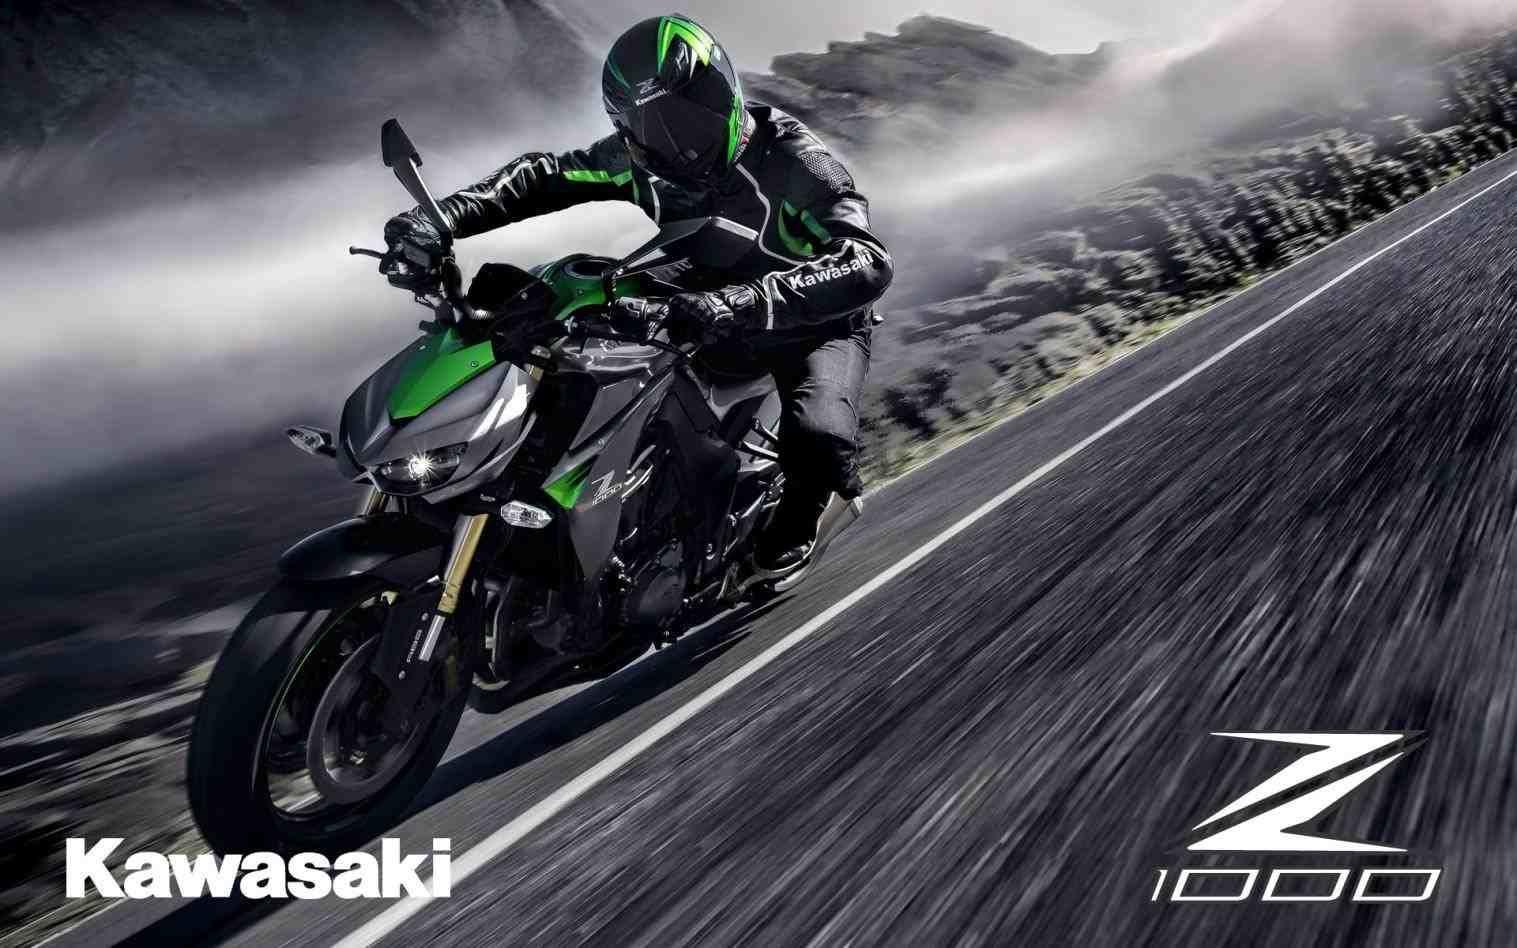 Kawasaki Z900 Abs Wallpaper For Widescreen Wallpaper on